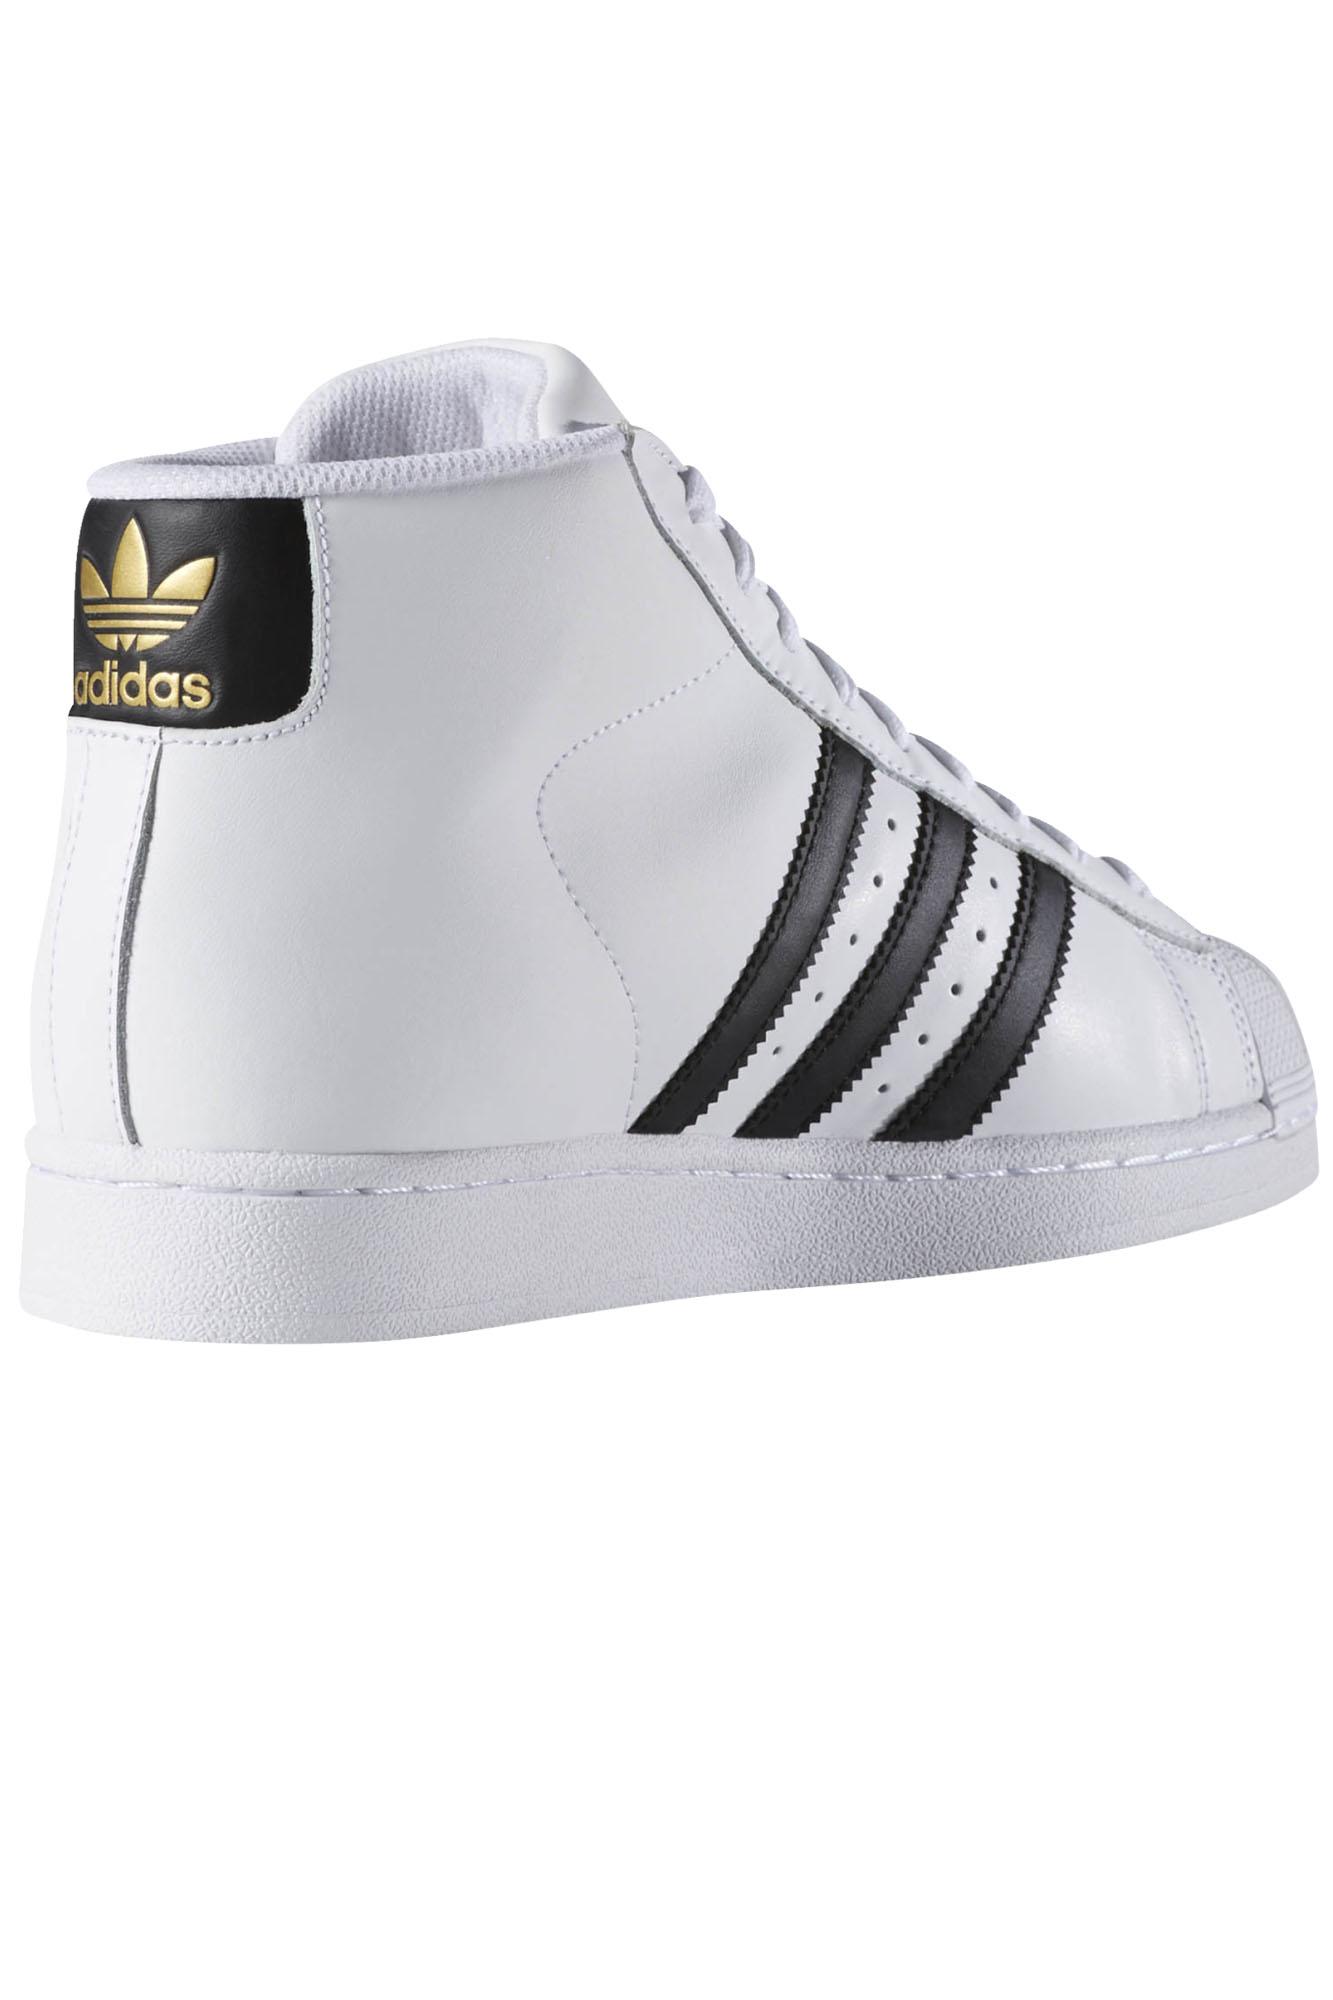 buty adidas originali (modello s85956 / na co dzie ń / buty